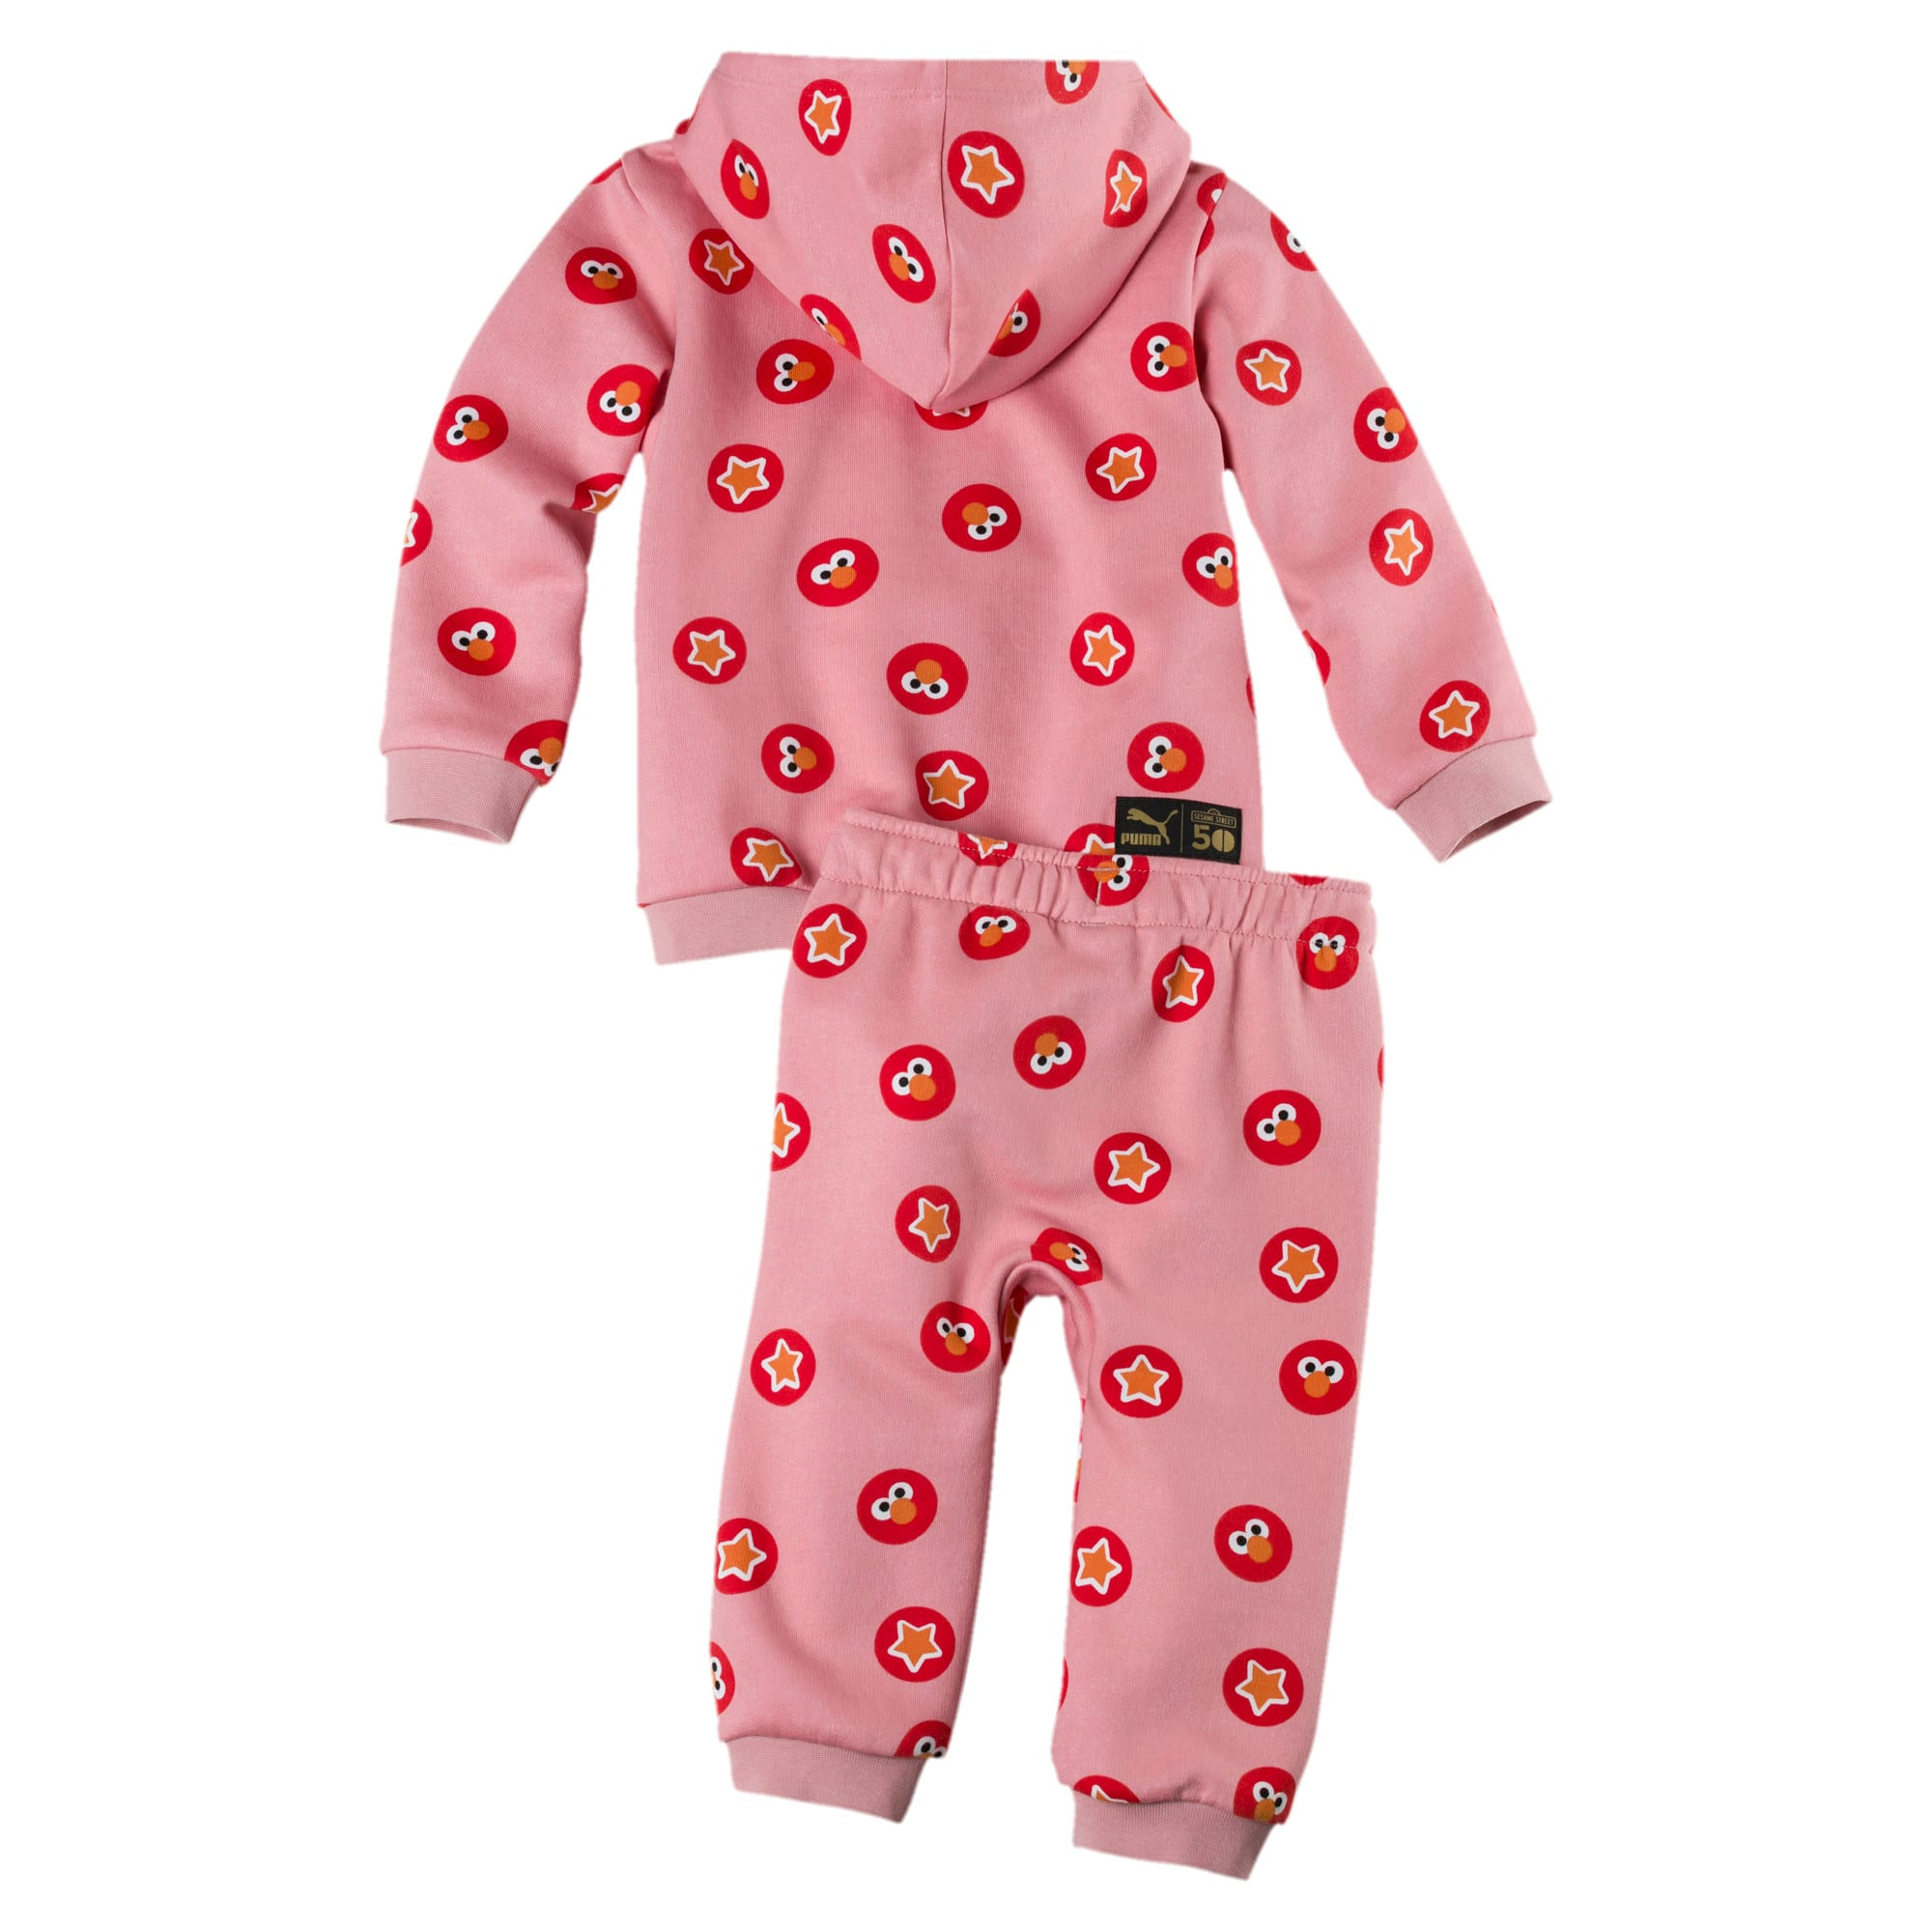 Thumbnail 2 of PUMA x SESAME STREET Infant + Toddler Two-Piece Jogger Set, Bridal Rose, medium